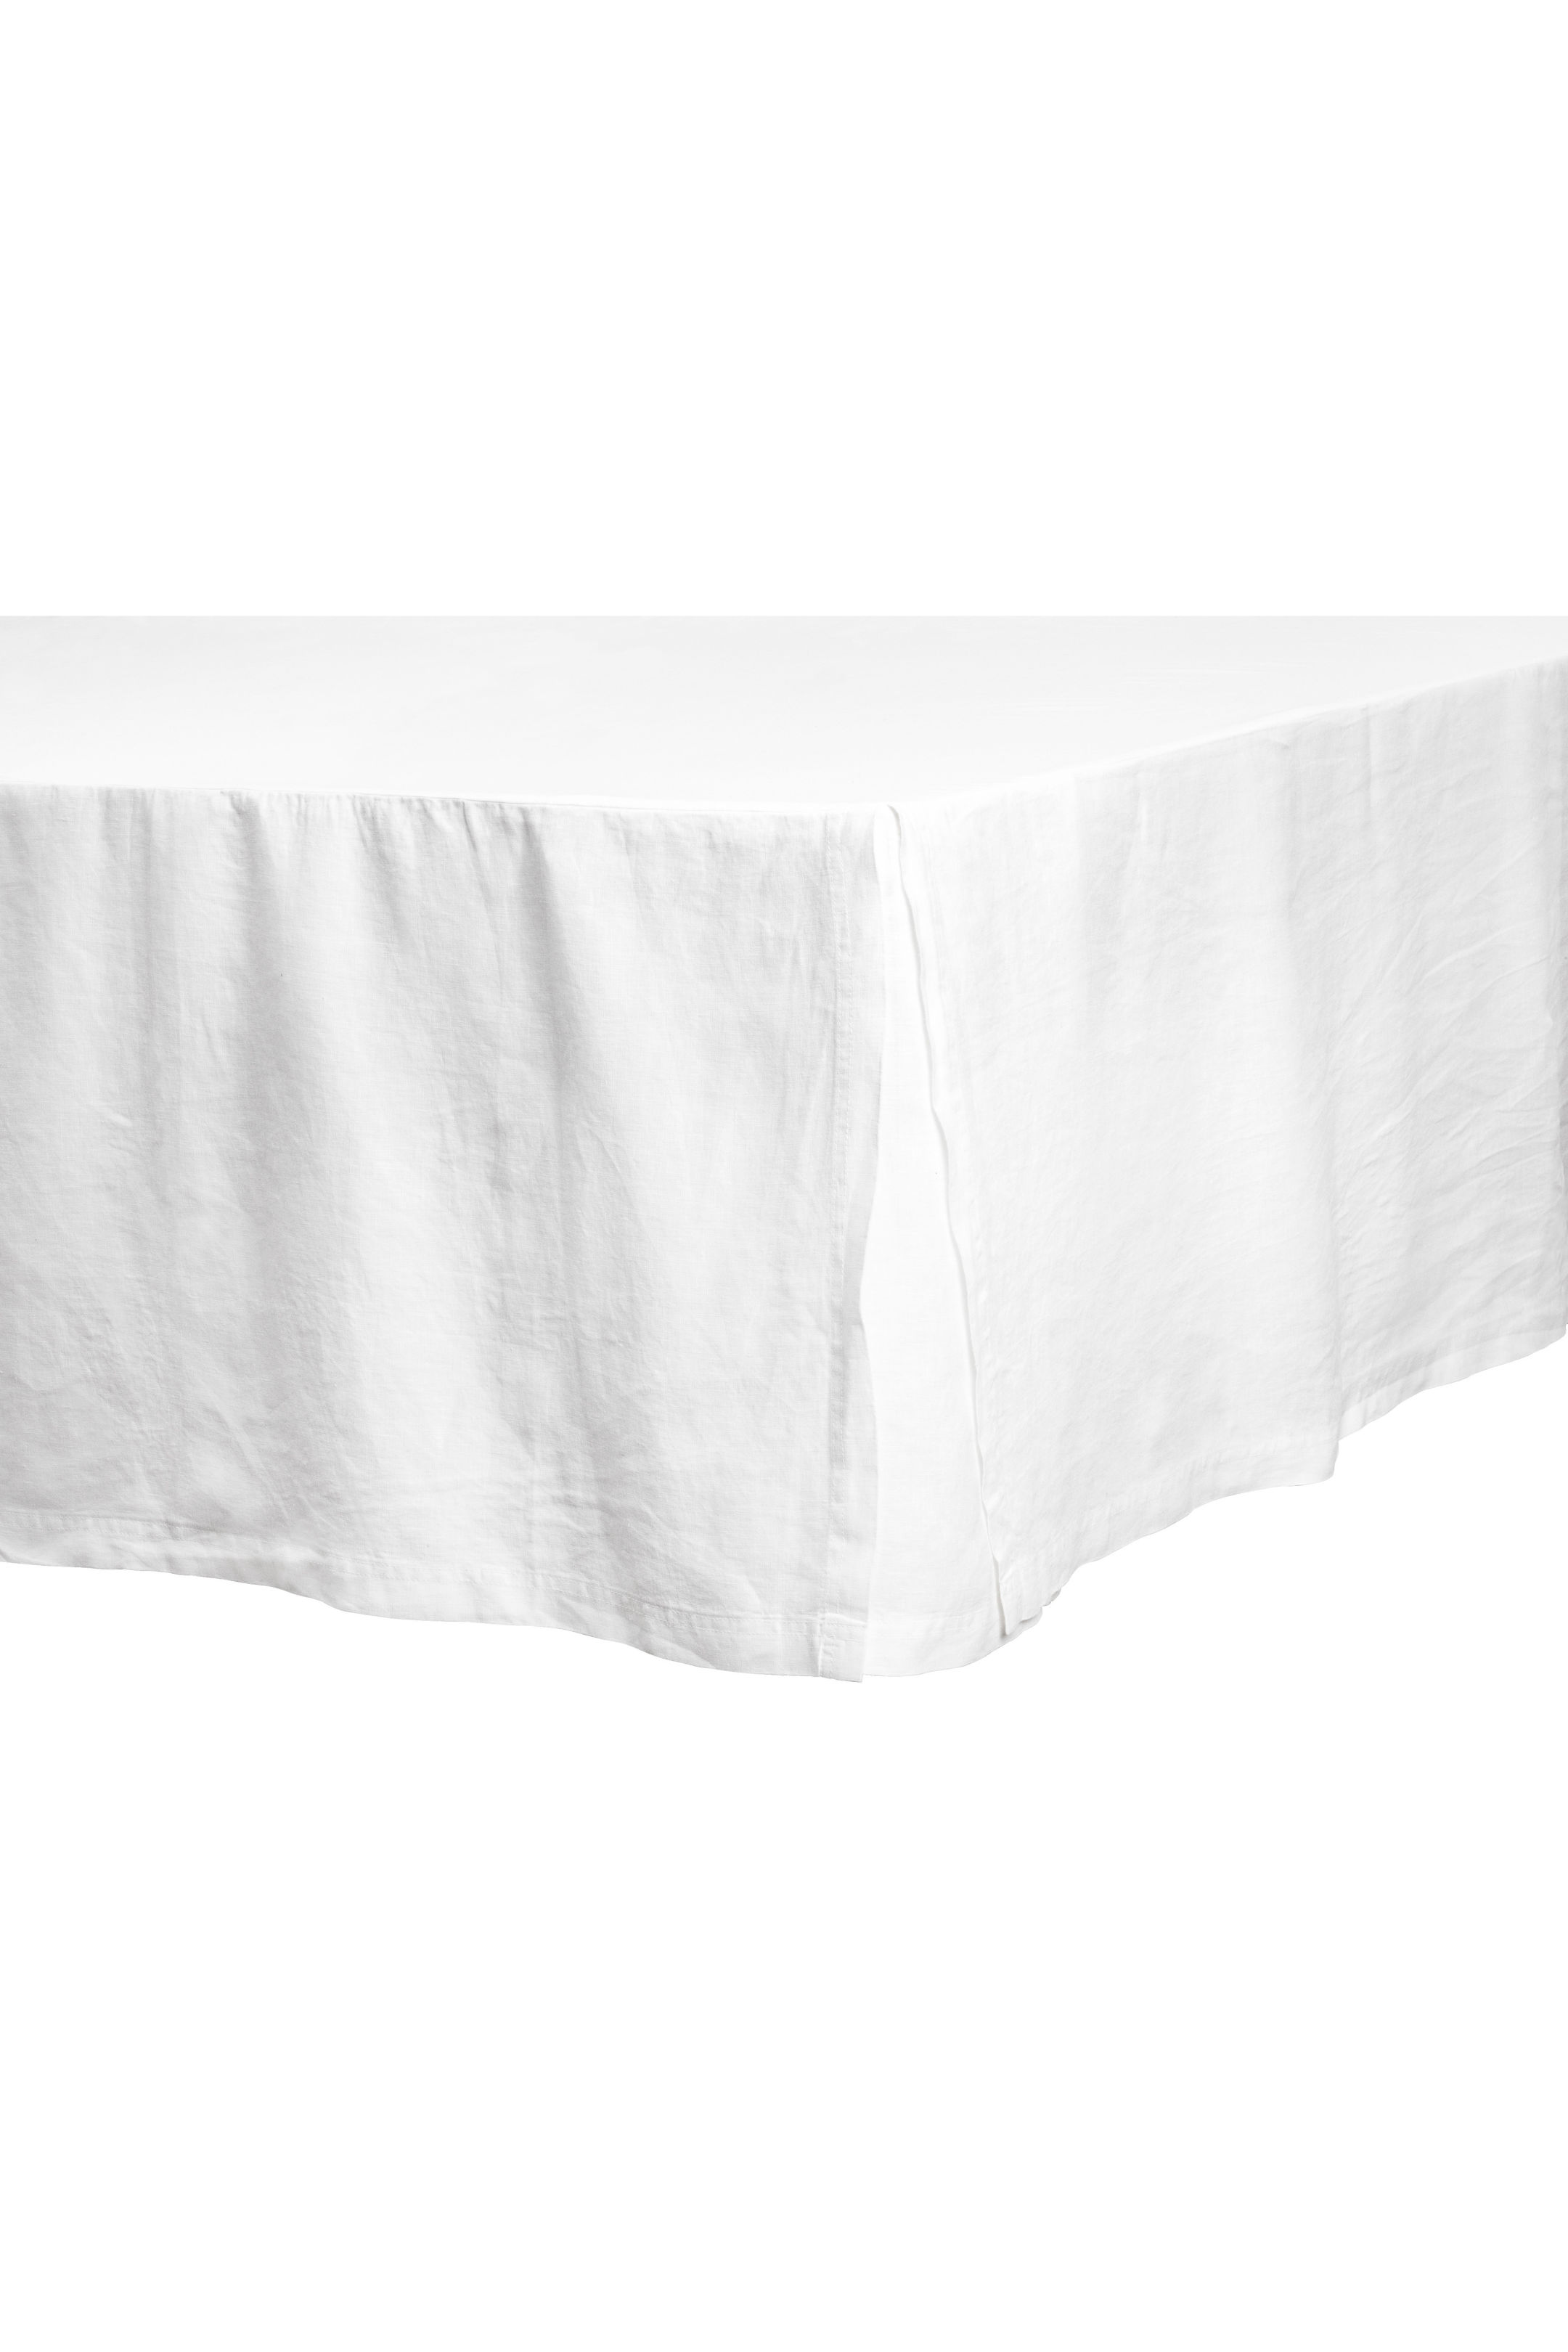 washed cotton bedskirt